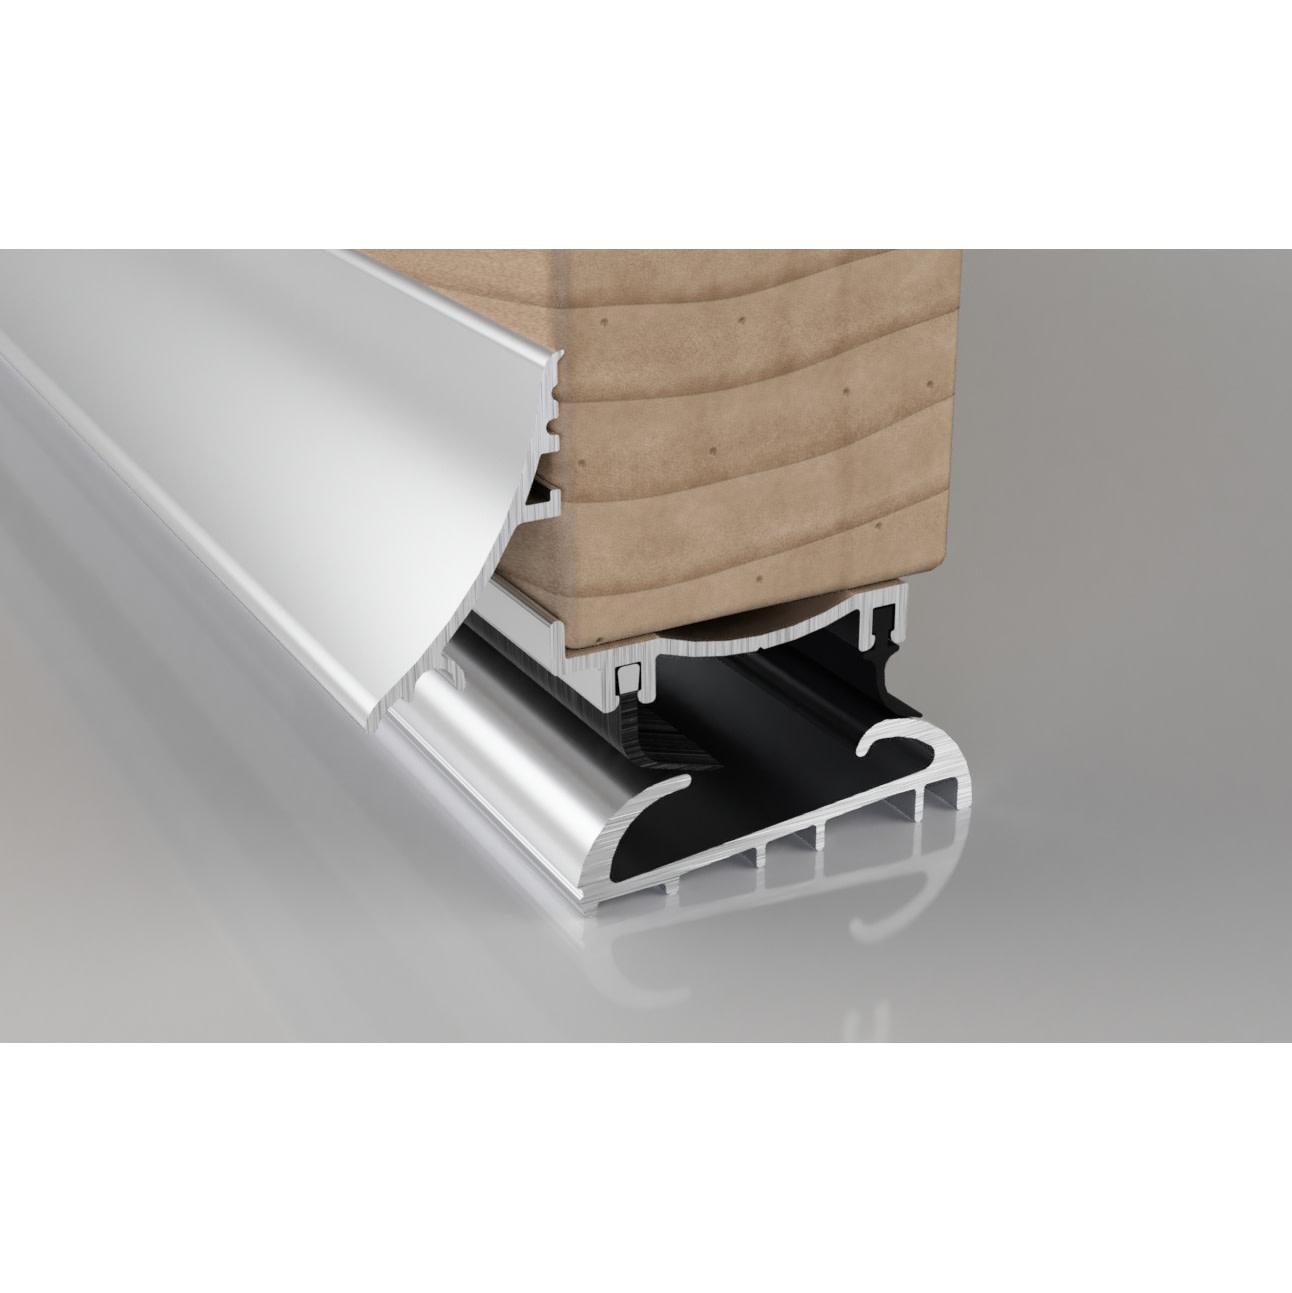 Stormguard Trimline 3-Part Threshold - 914mm - Silver)